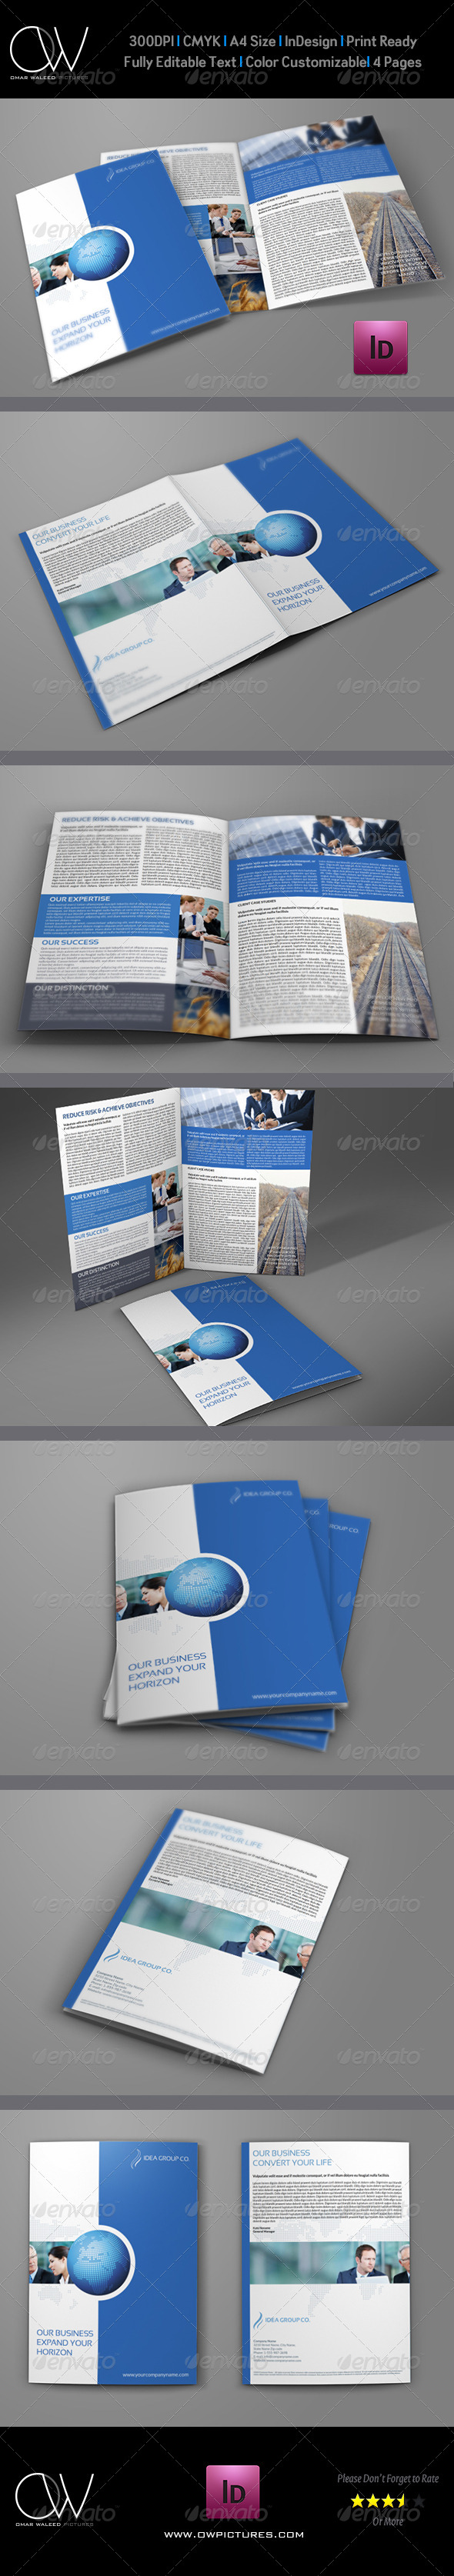 Company Brochure Bi-Fold Template Vol.18 - Corporate Brochures